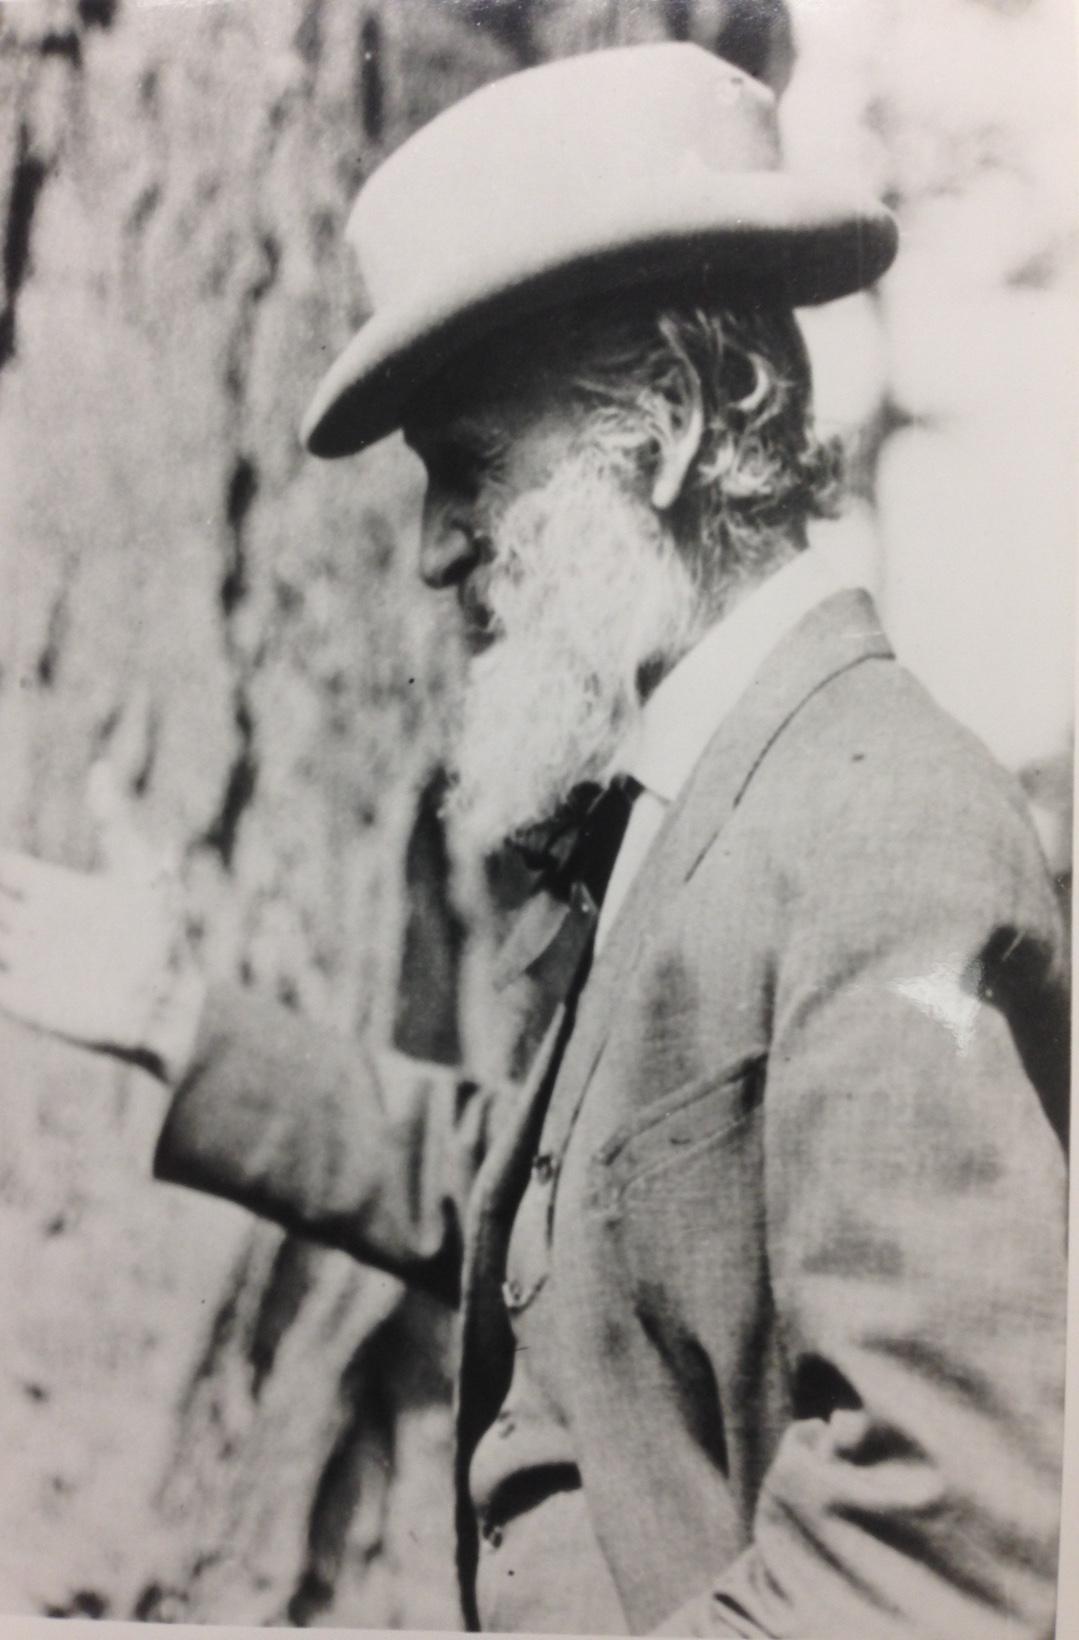 Scott Pruitt Quotes John Muir Muir Wouldnt Like That Sierra Club